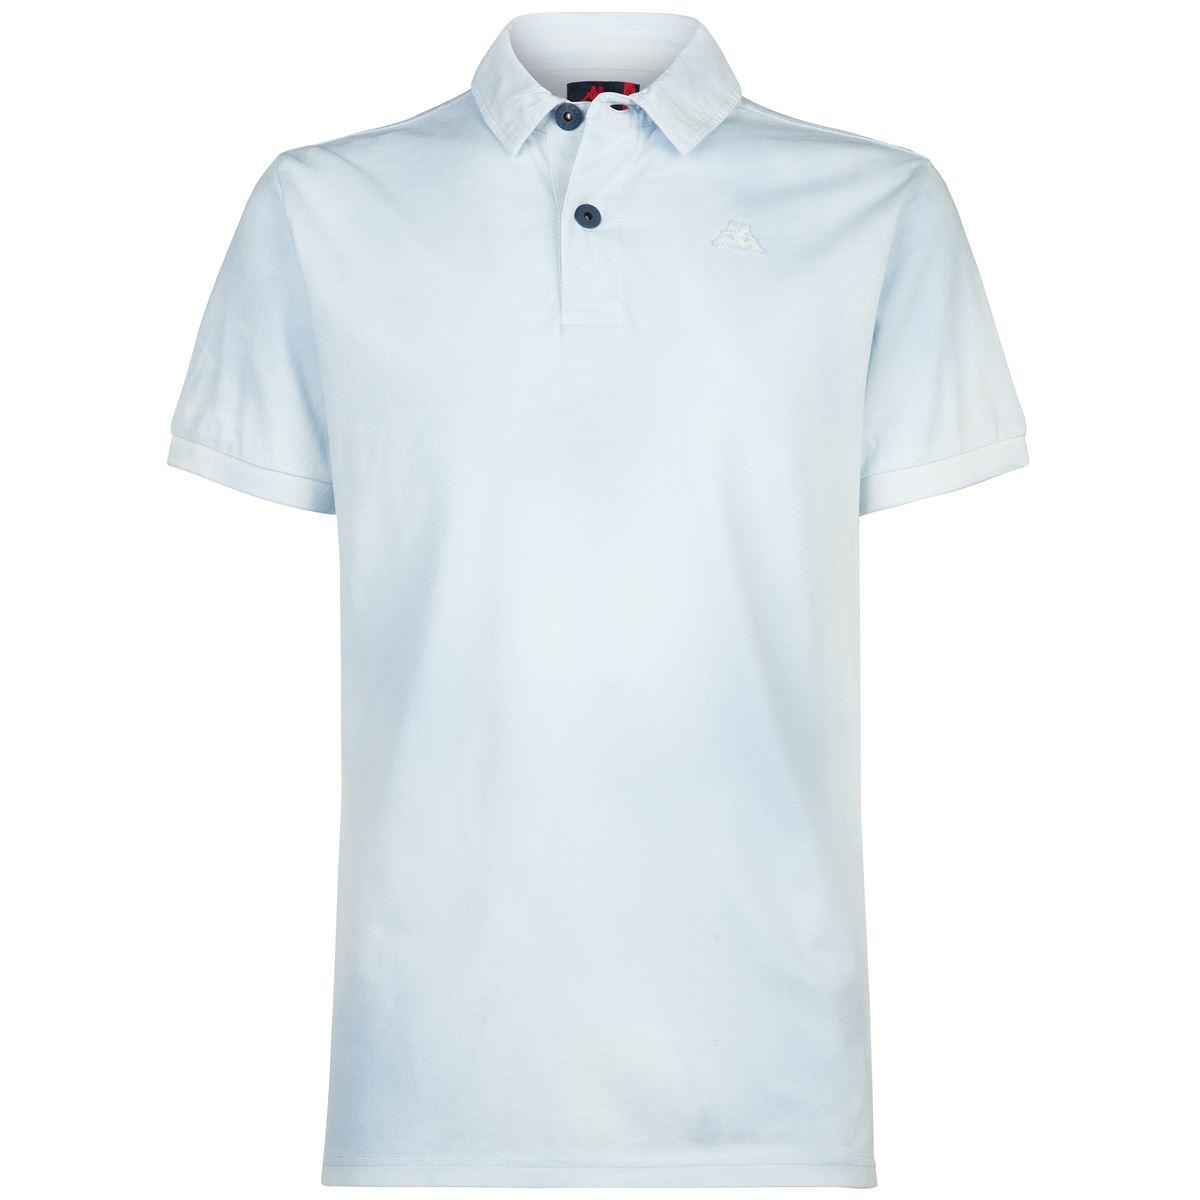 Robe di Kappa Polo Shirts uomo-61113CW